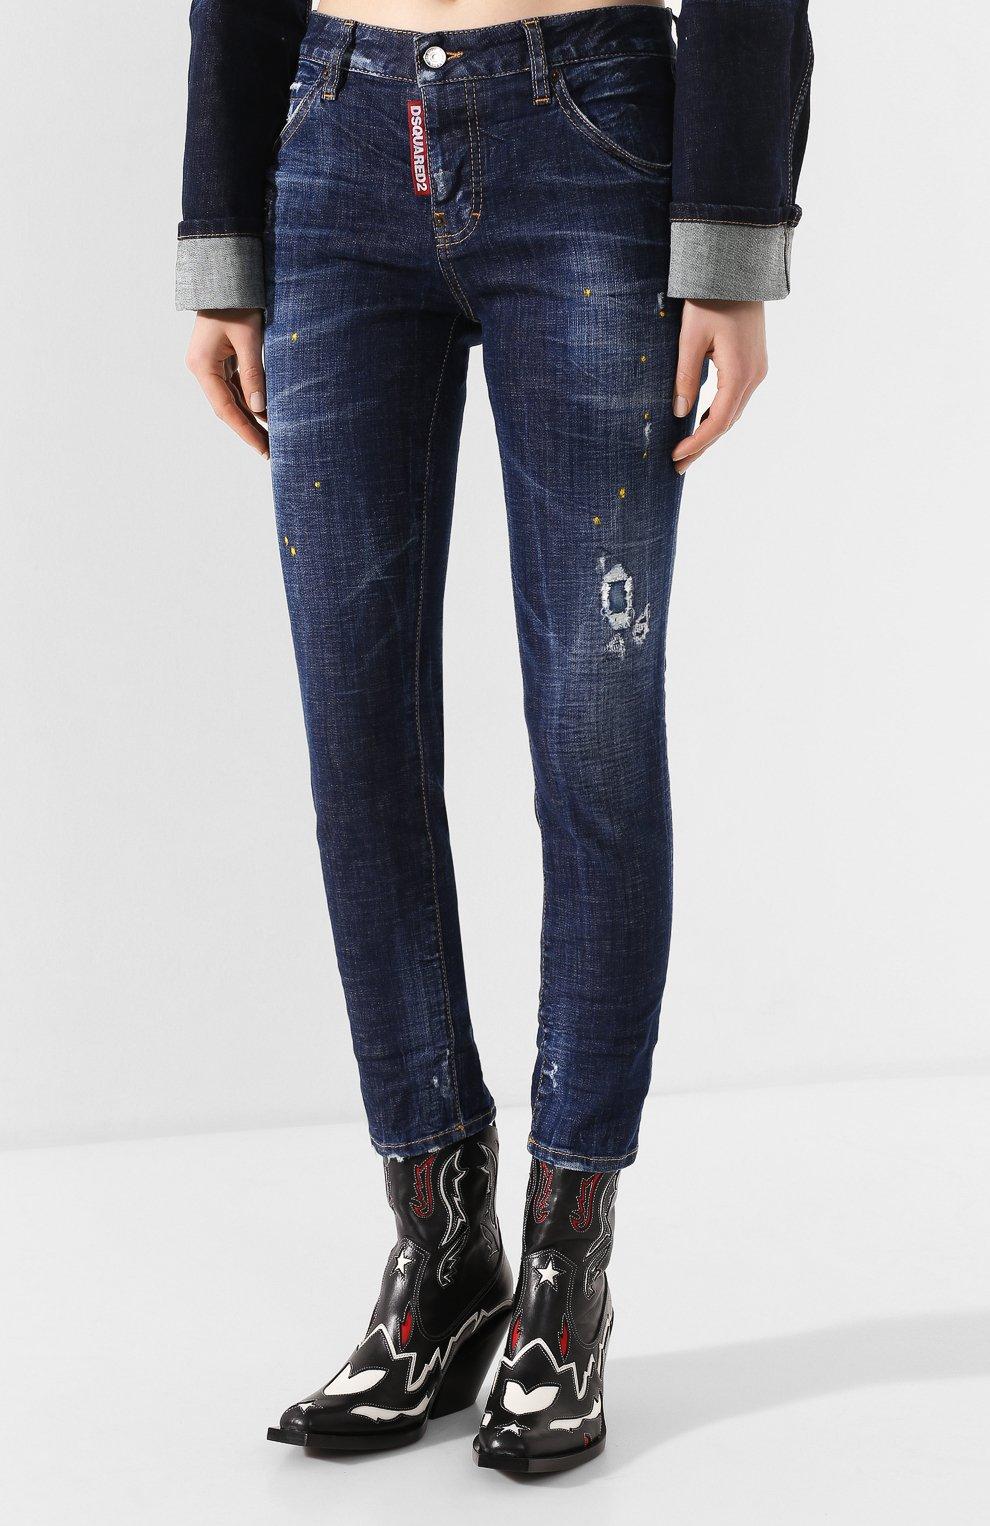 Женские джинсы DSQUARED2 синего цвета, арт. S72LB0308/S30342 | Фото 3